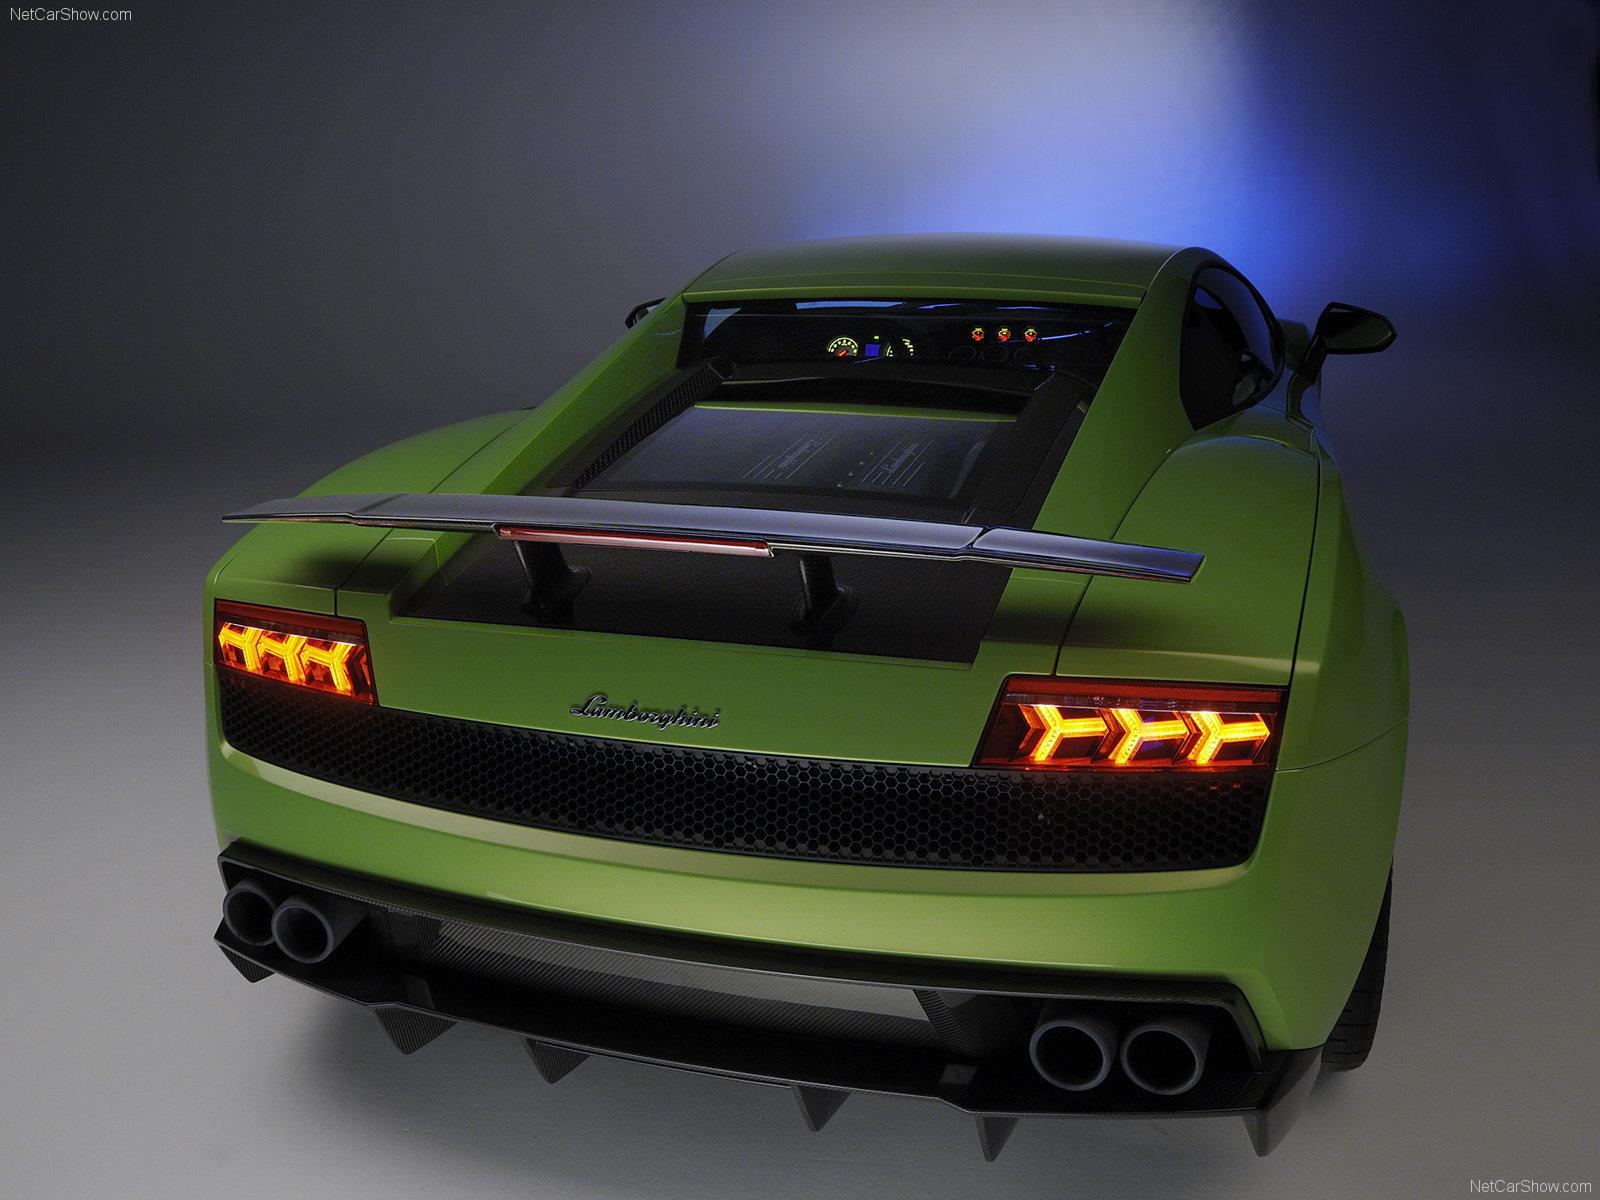 Pic Link: Https://www.carsbase.com/photo/lamborghini/lamborghini Gallardo  Lp570 4 Superleggera Mk28 Pic72864